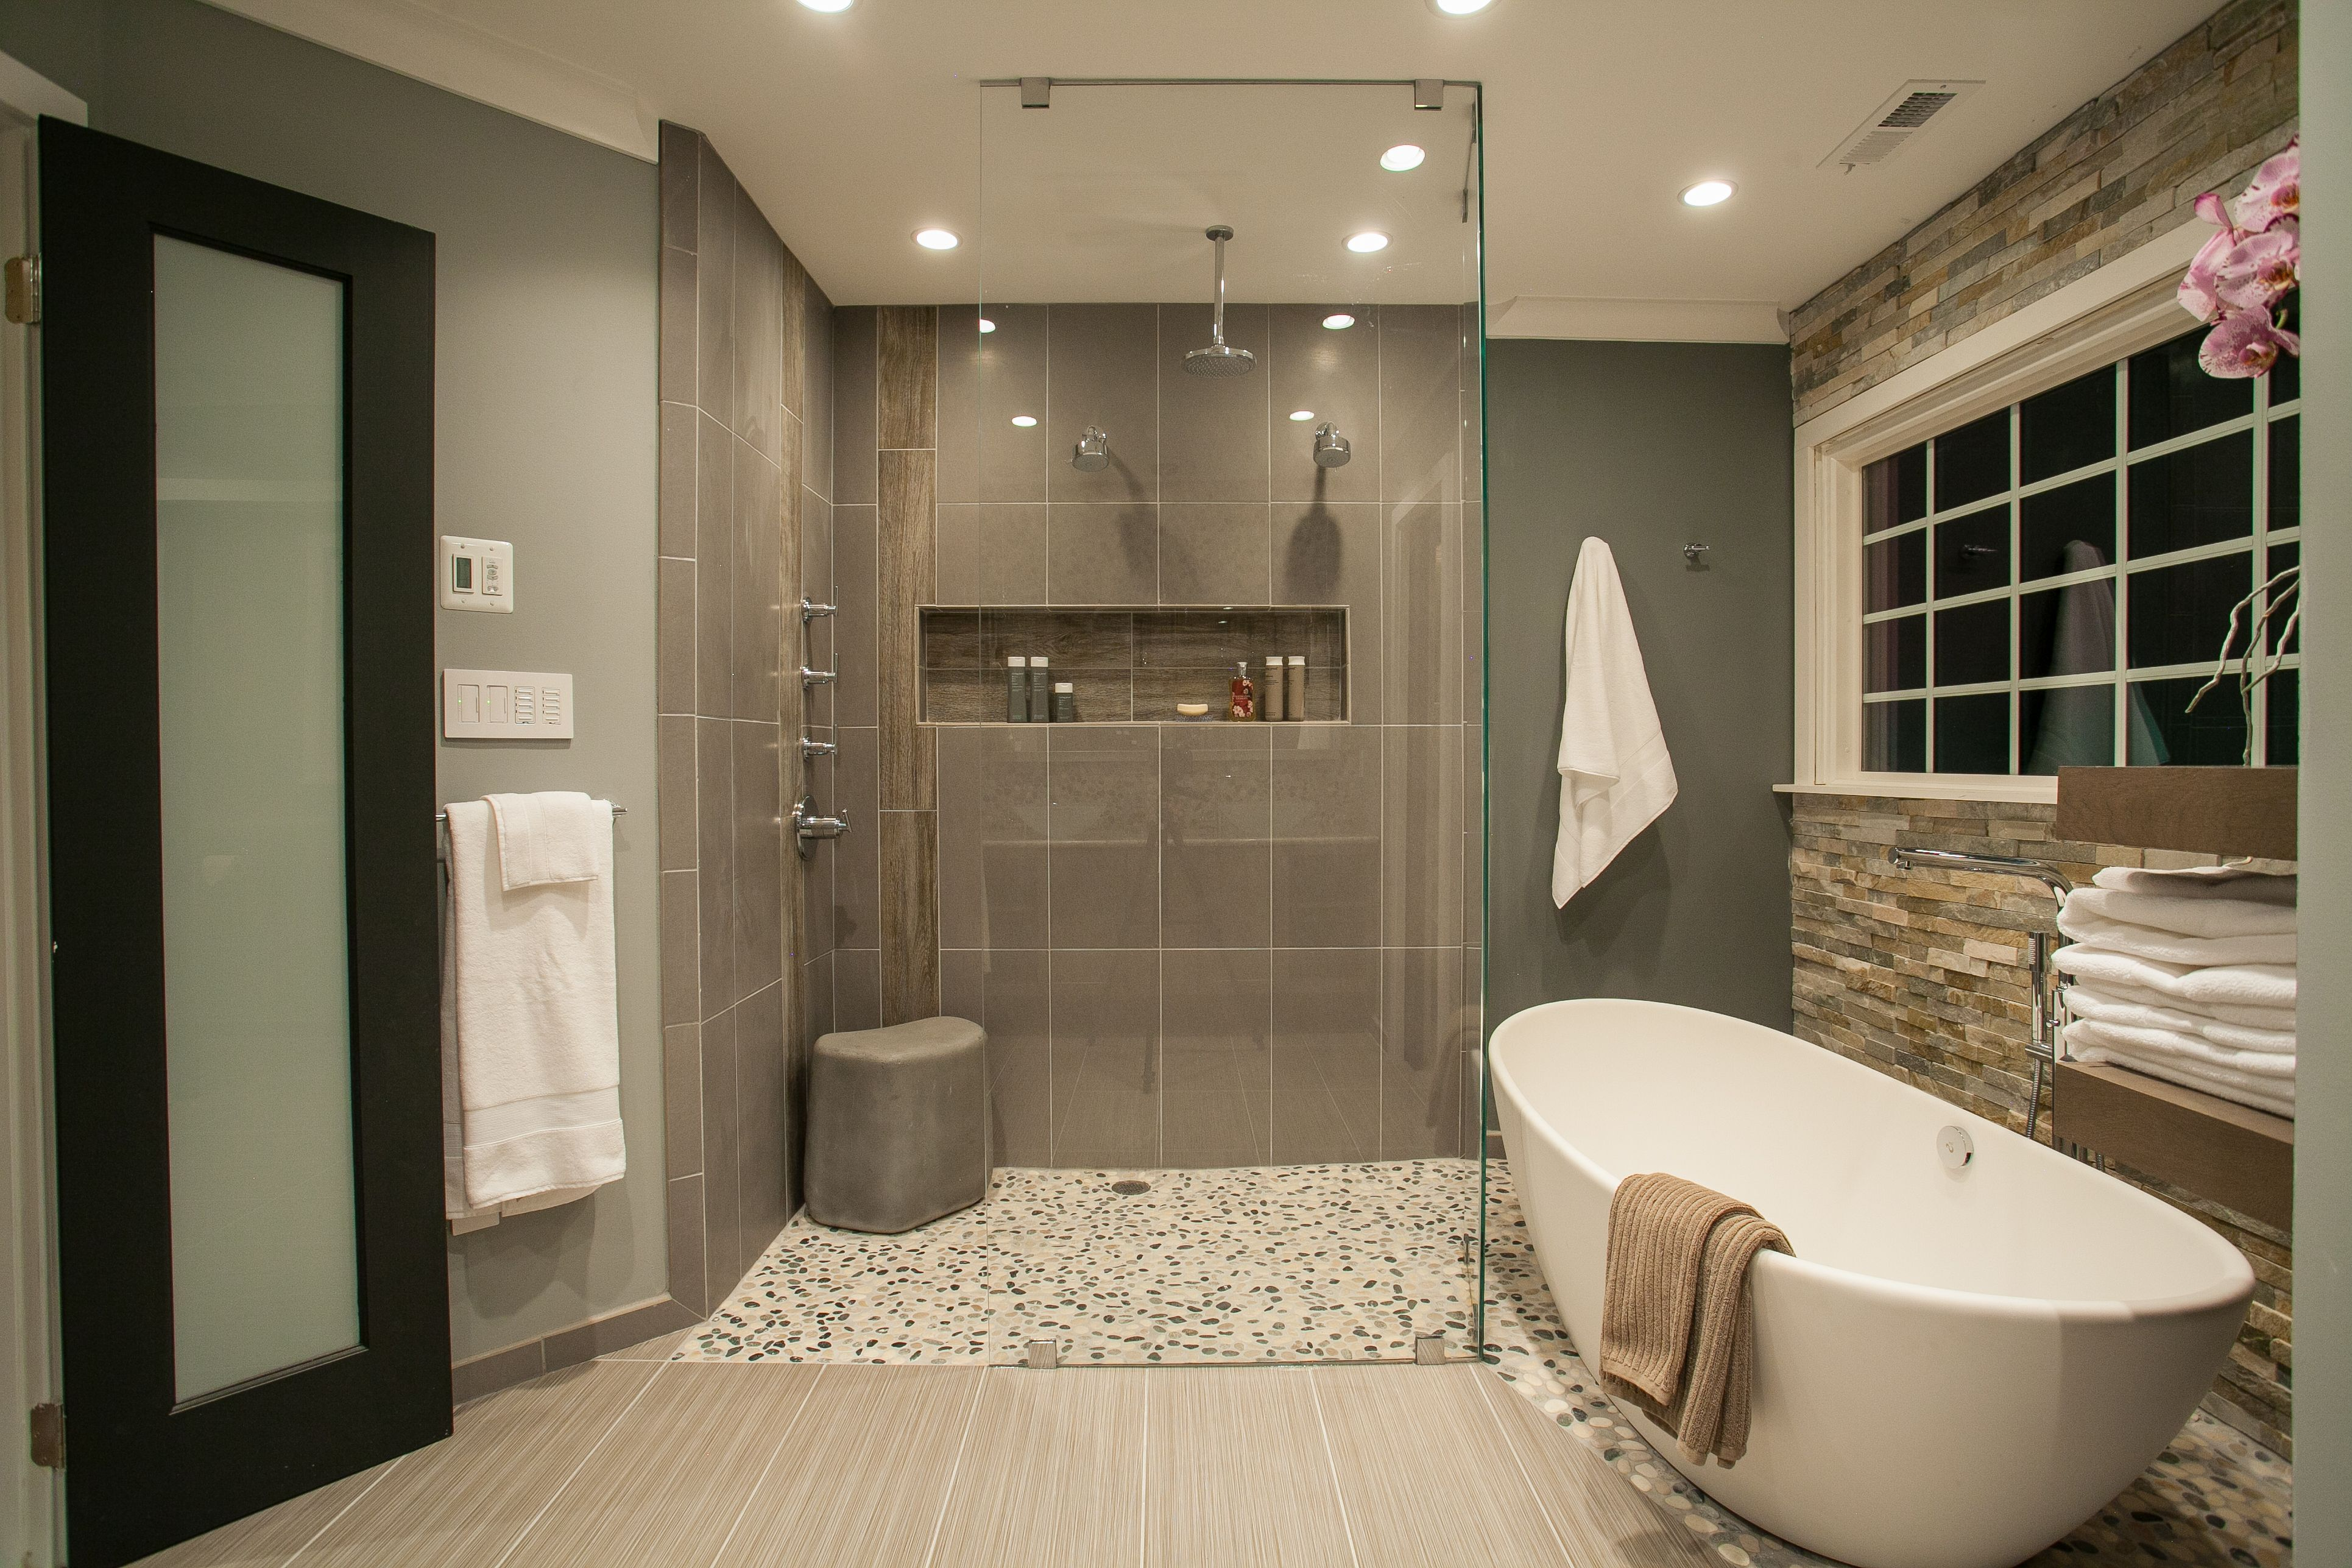 6 Design Ideas For Spa-Like Bathrooms